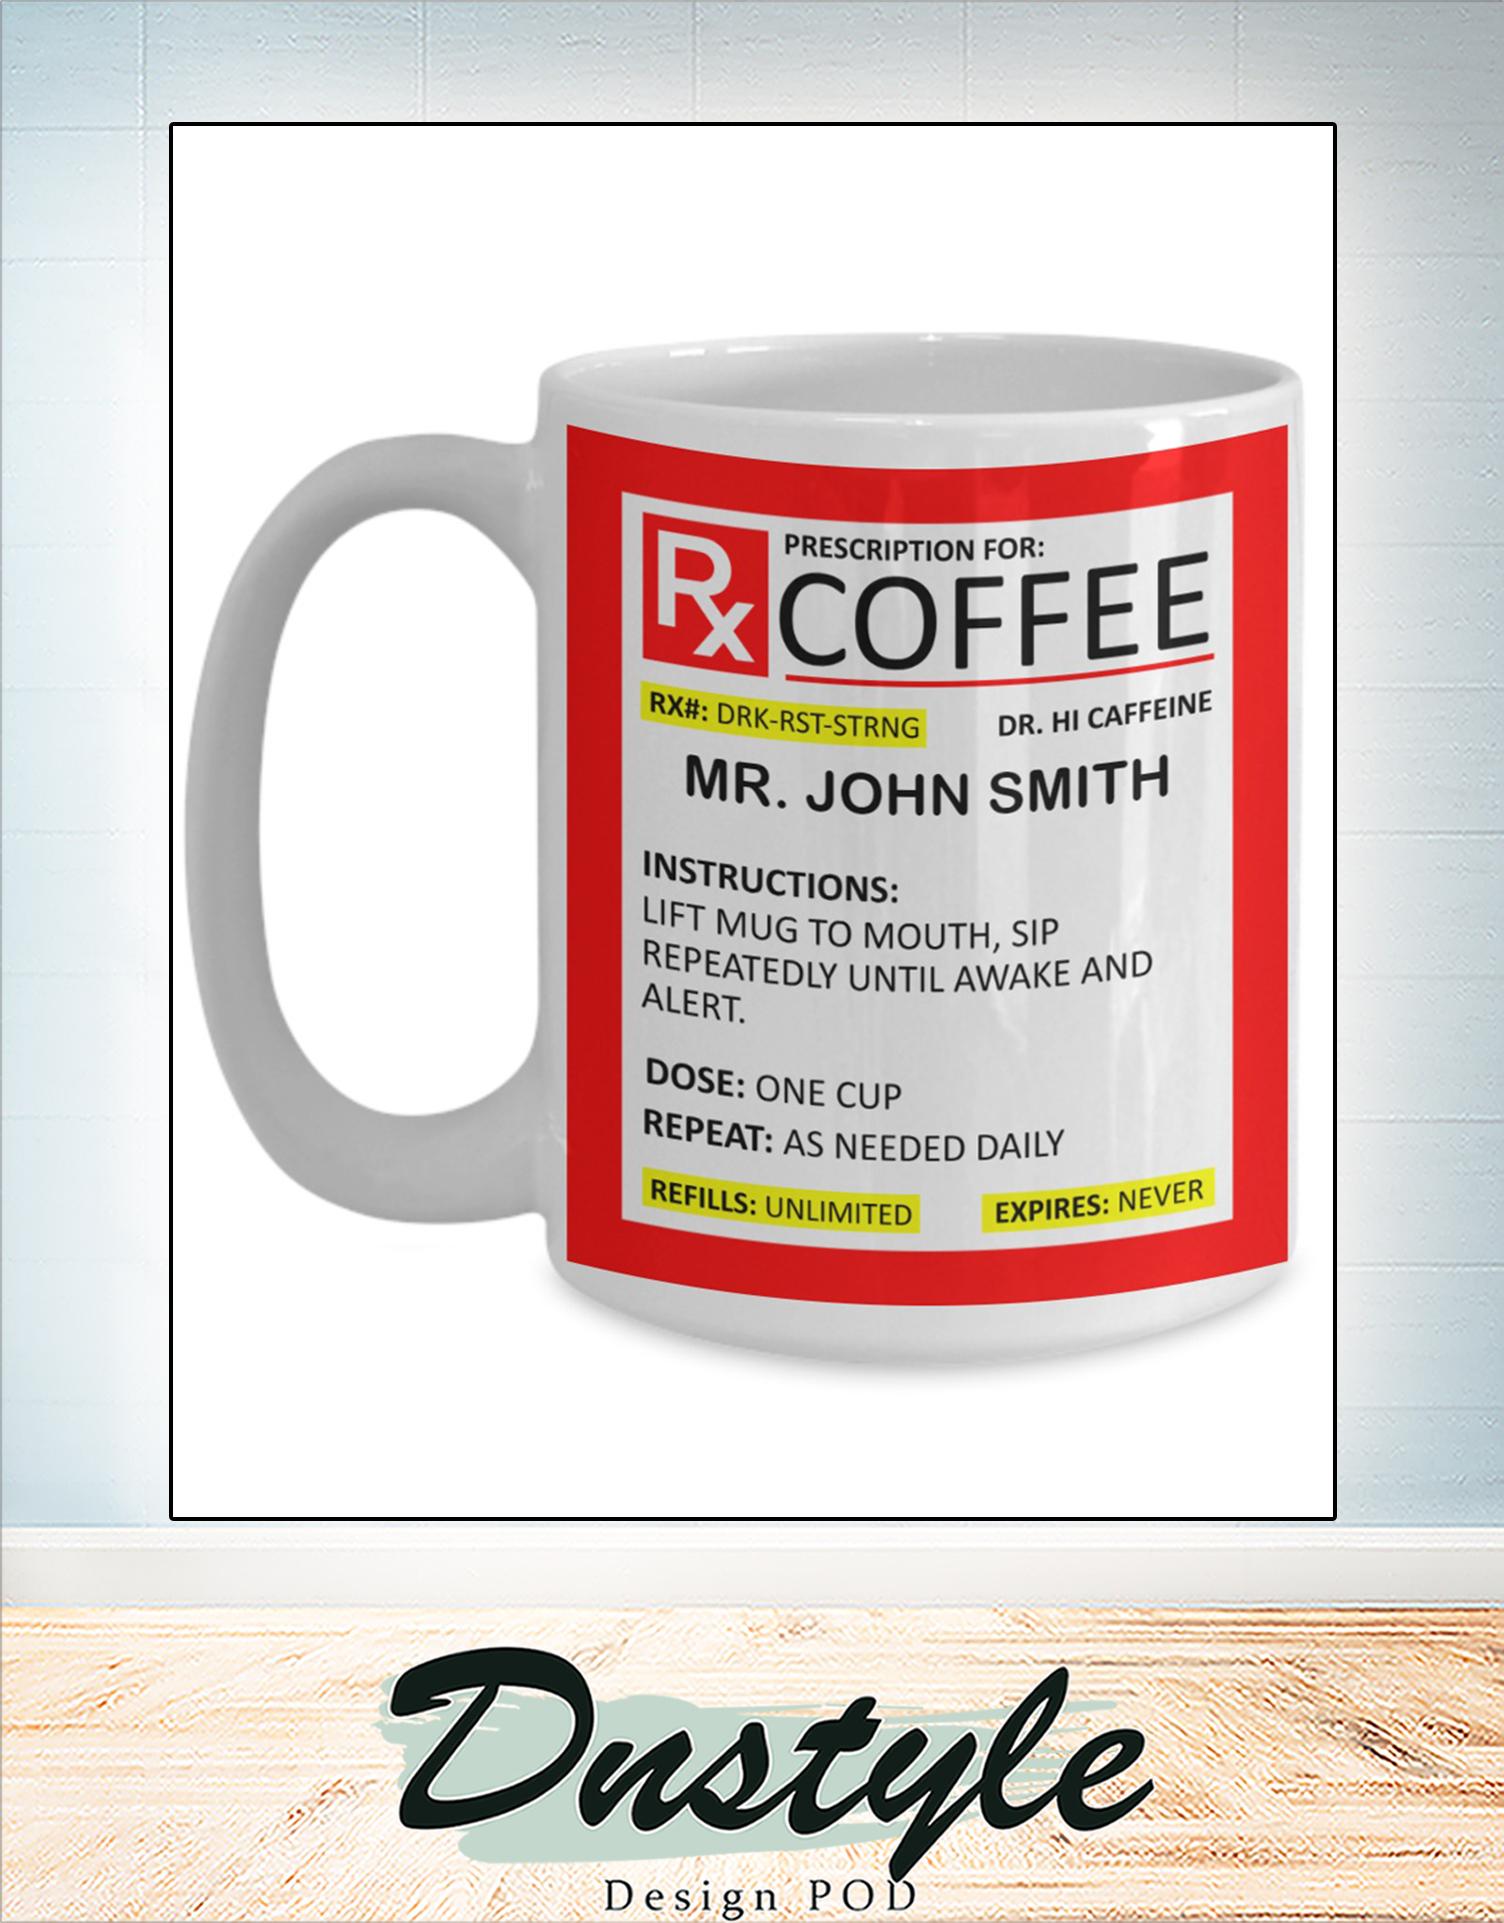 Personalized Prescription for coffee mug